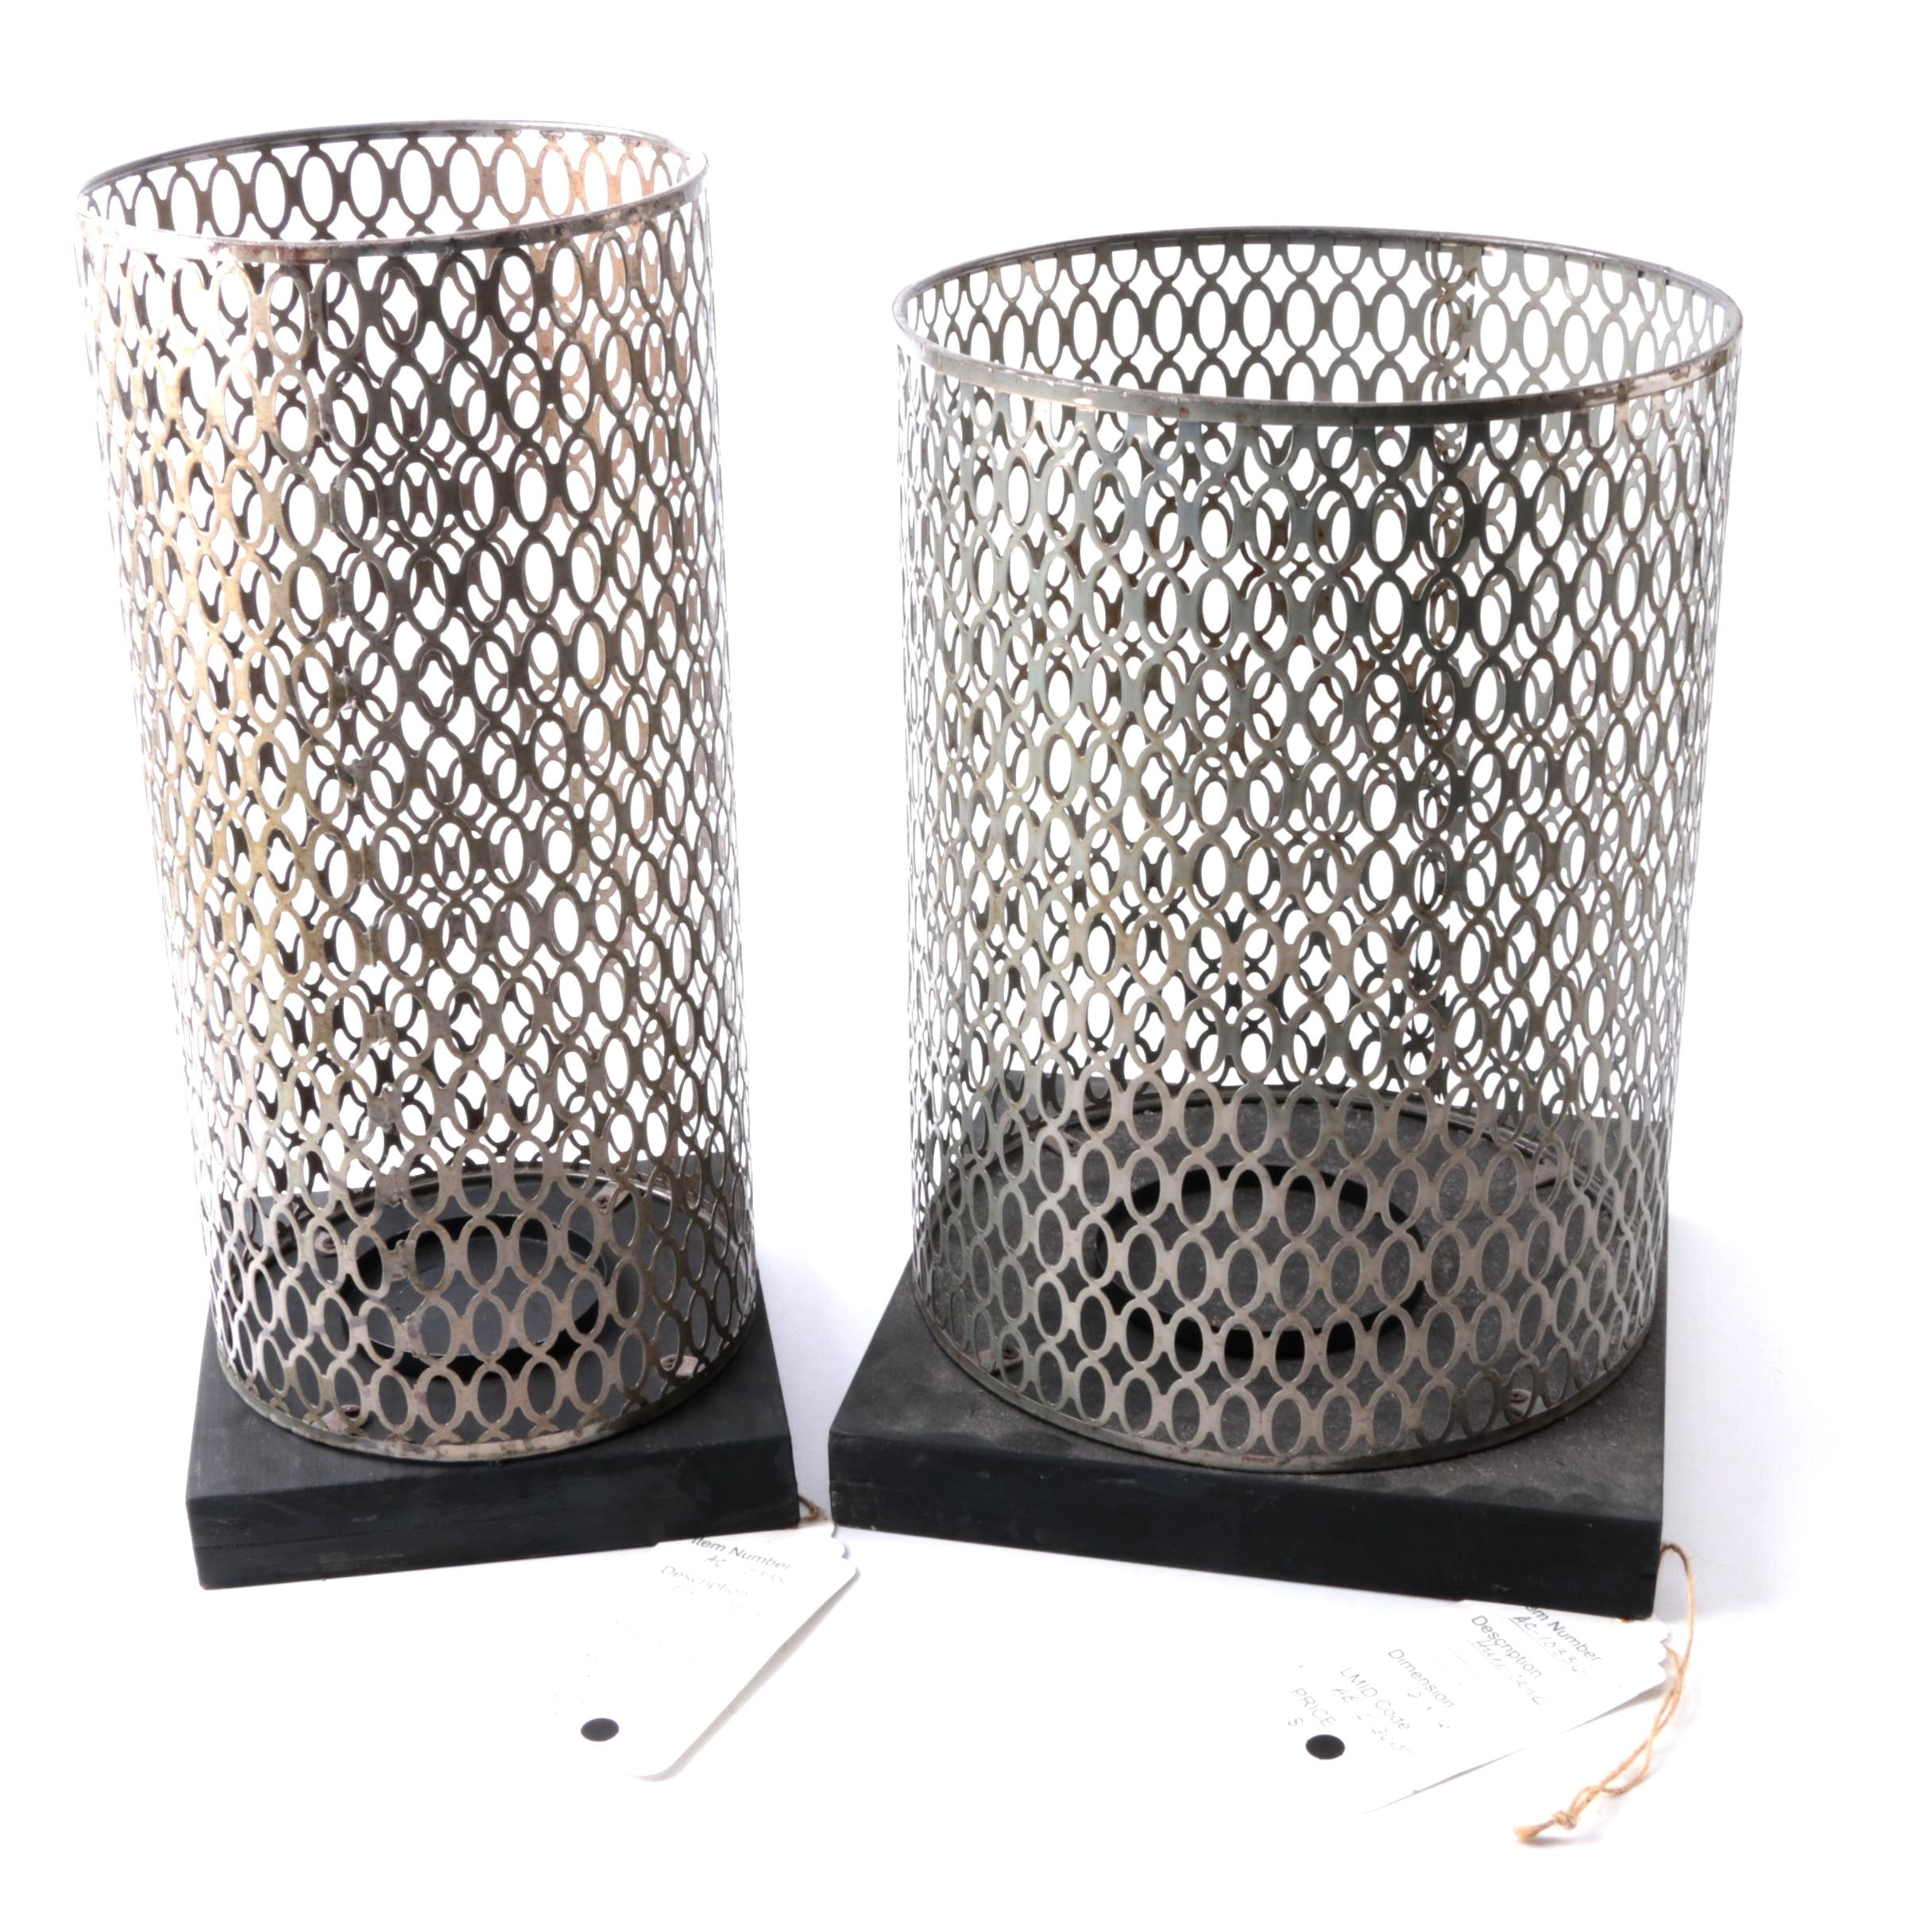 Pair of Metal Hurricane Pillar Candle Holders